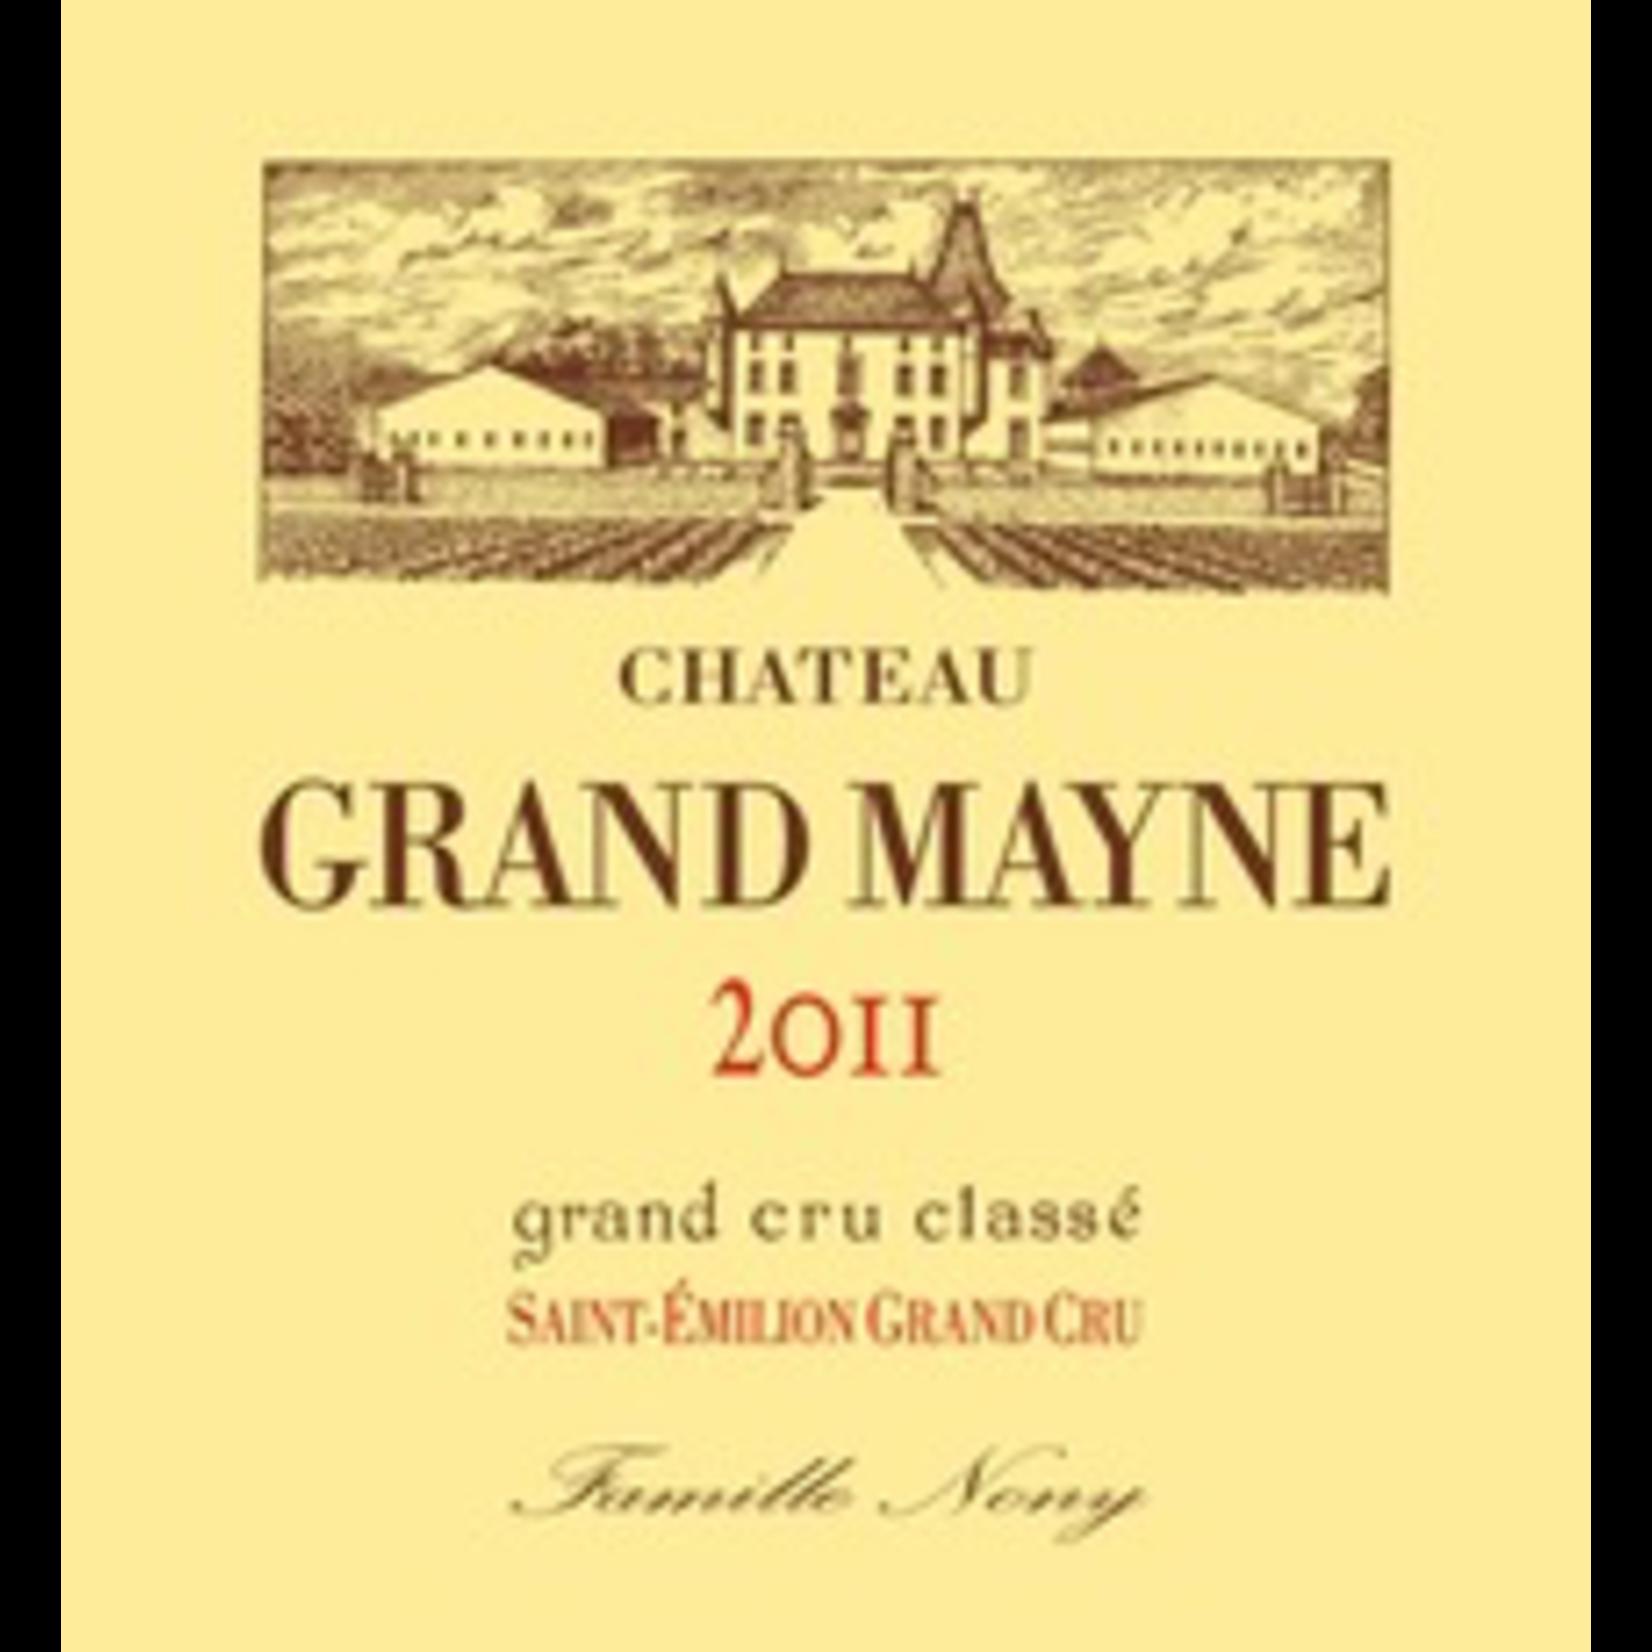 Chateau Grand Mayne, Saint-Emilion 2011